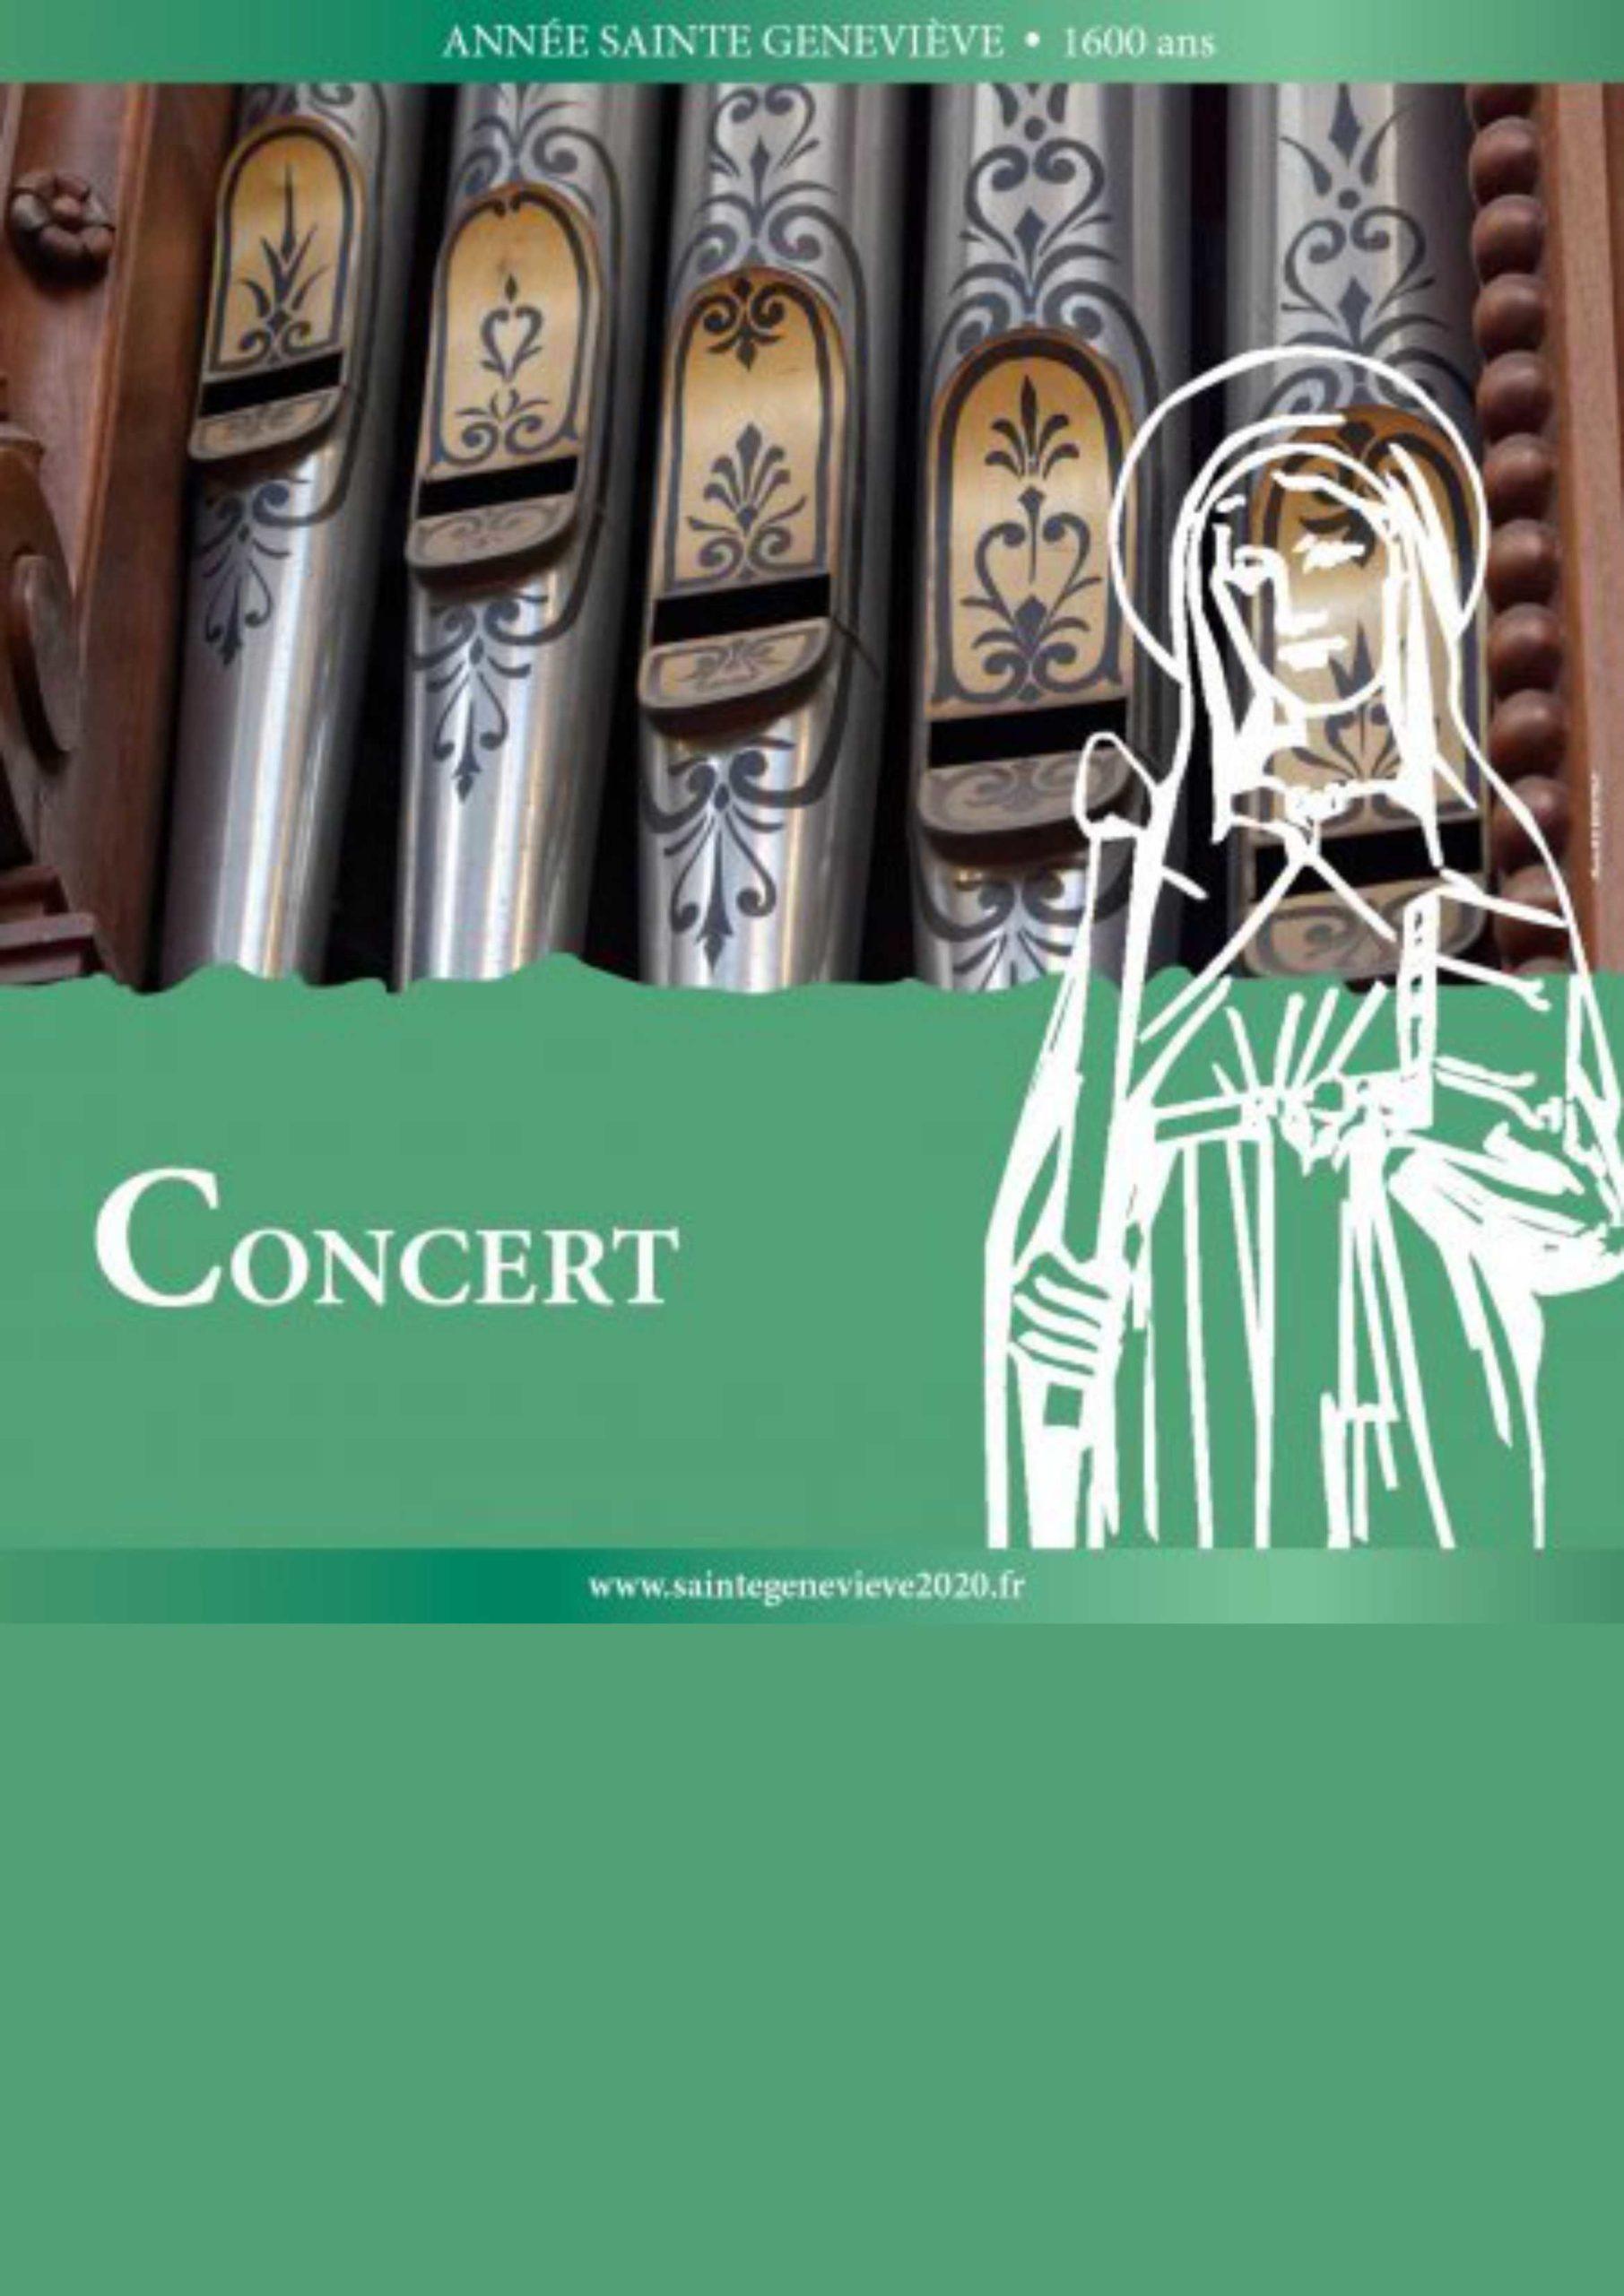 Oratorio Ste Geneviève Eric Lebrun - Église Saint Antoine des XV/XX